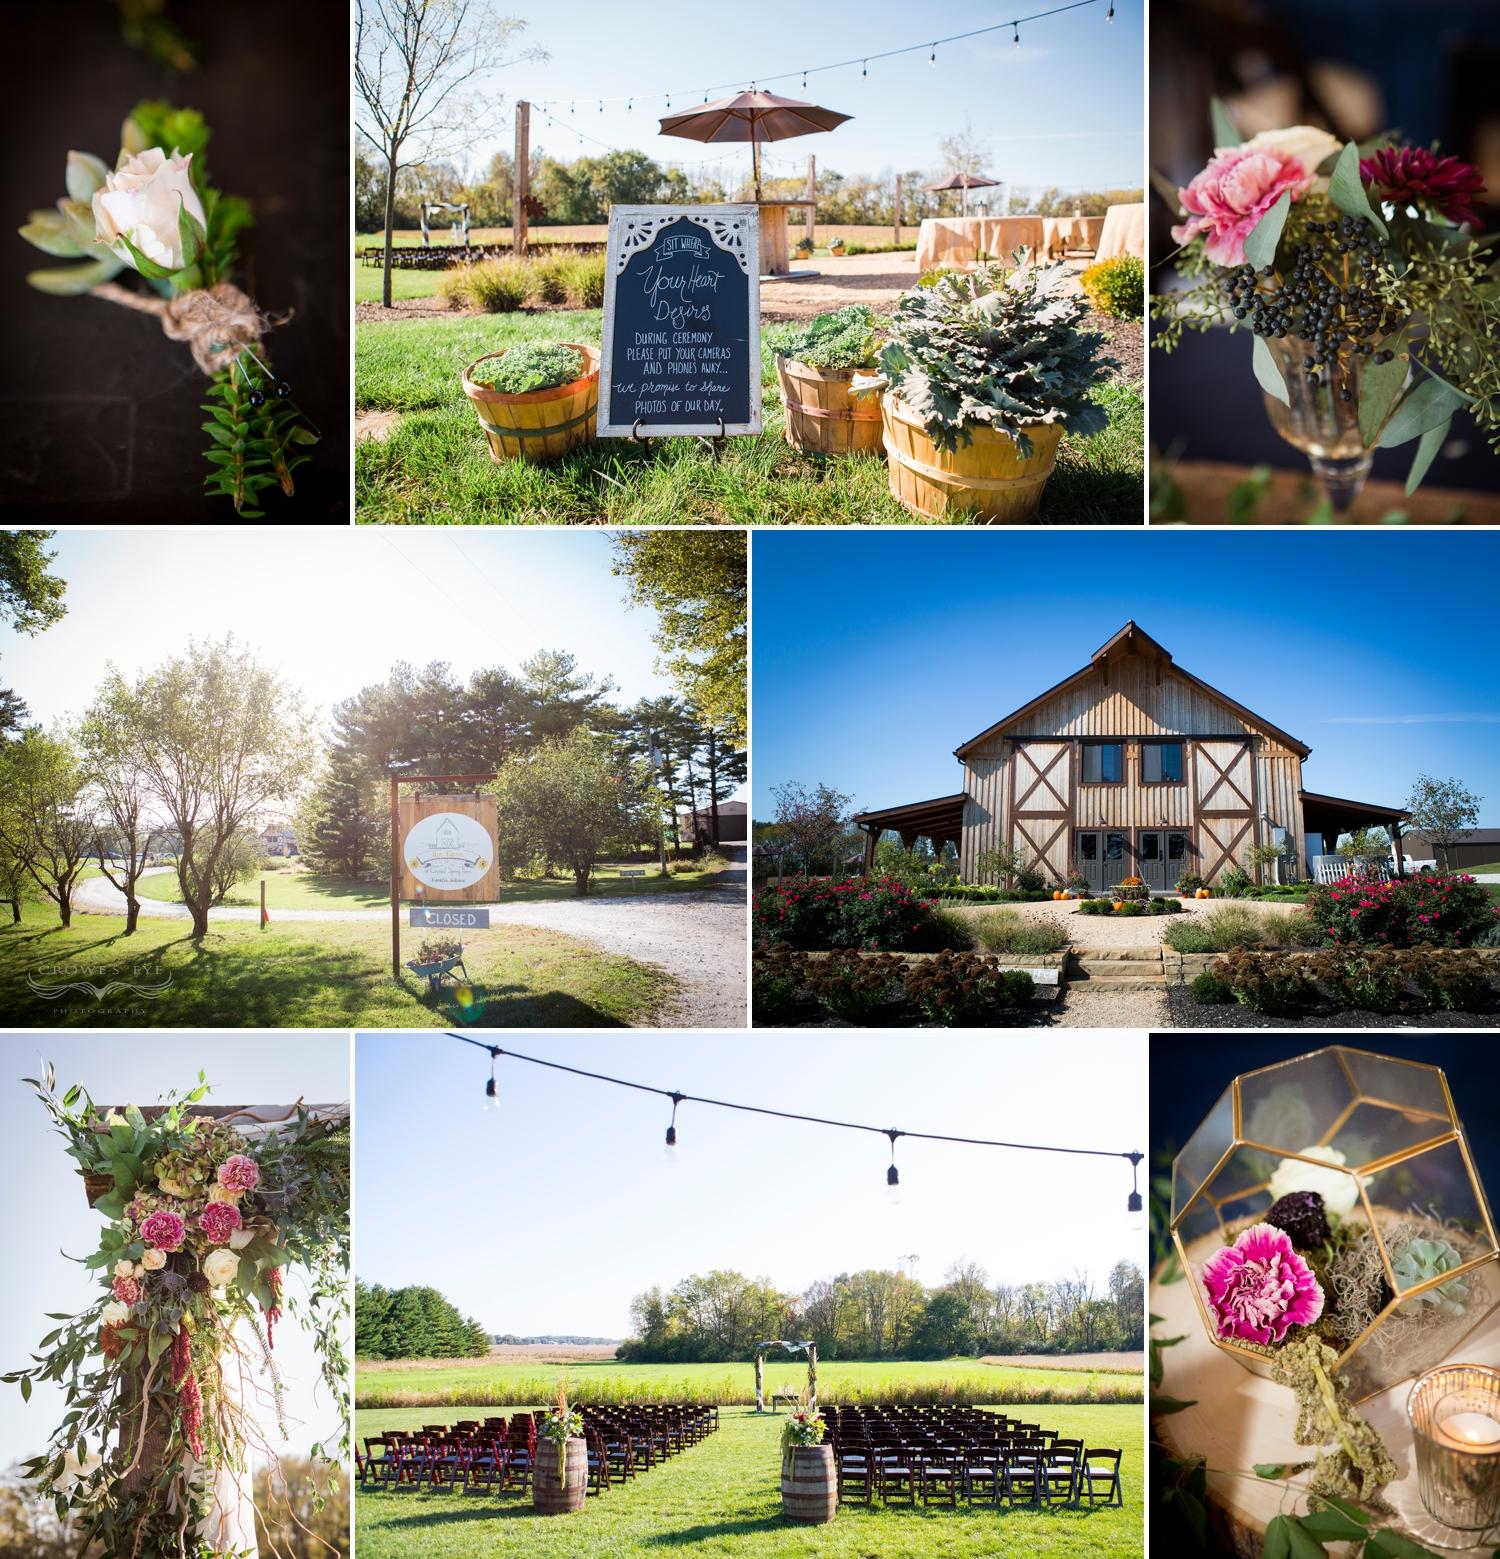 Barn_Crystal__Springs_Farm_Wedding_Indiana.jpg